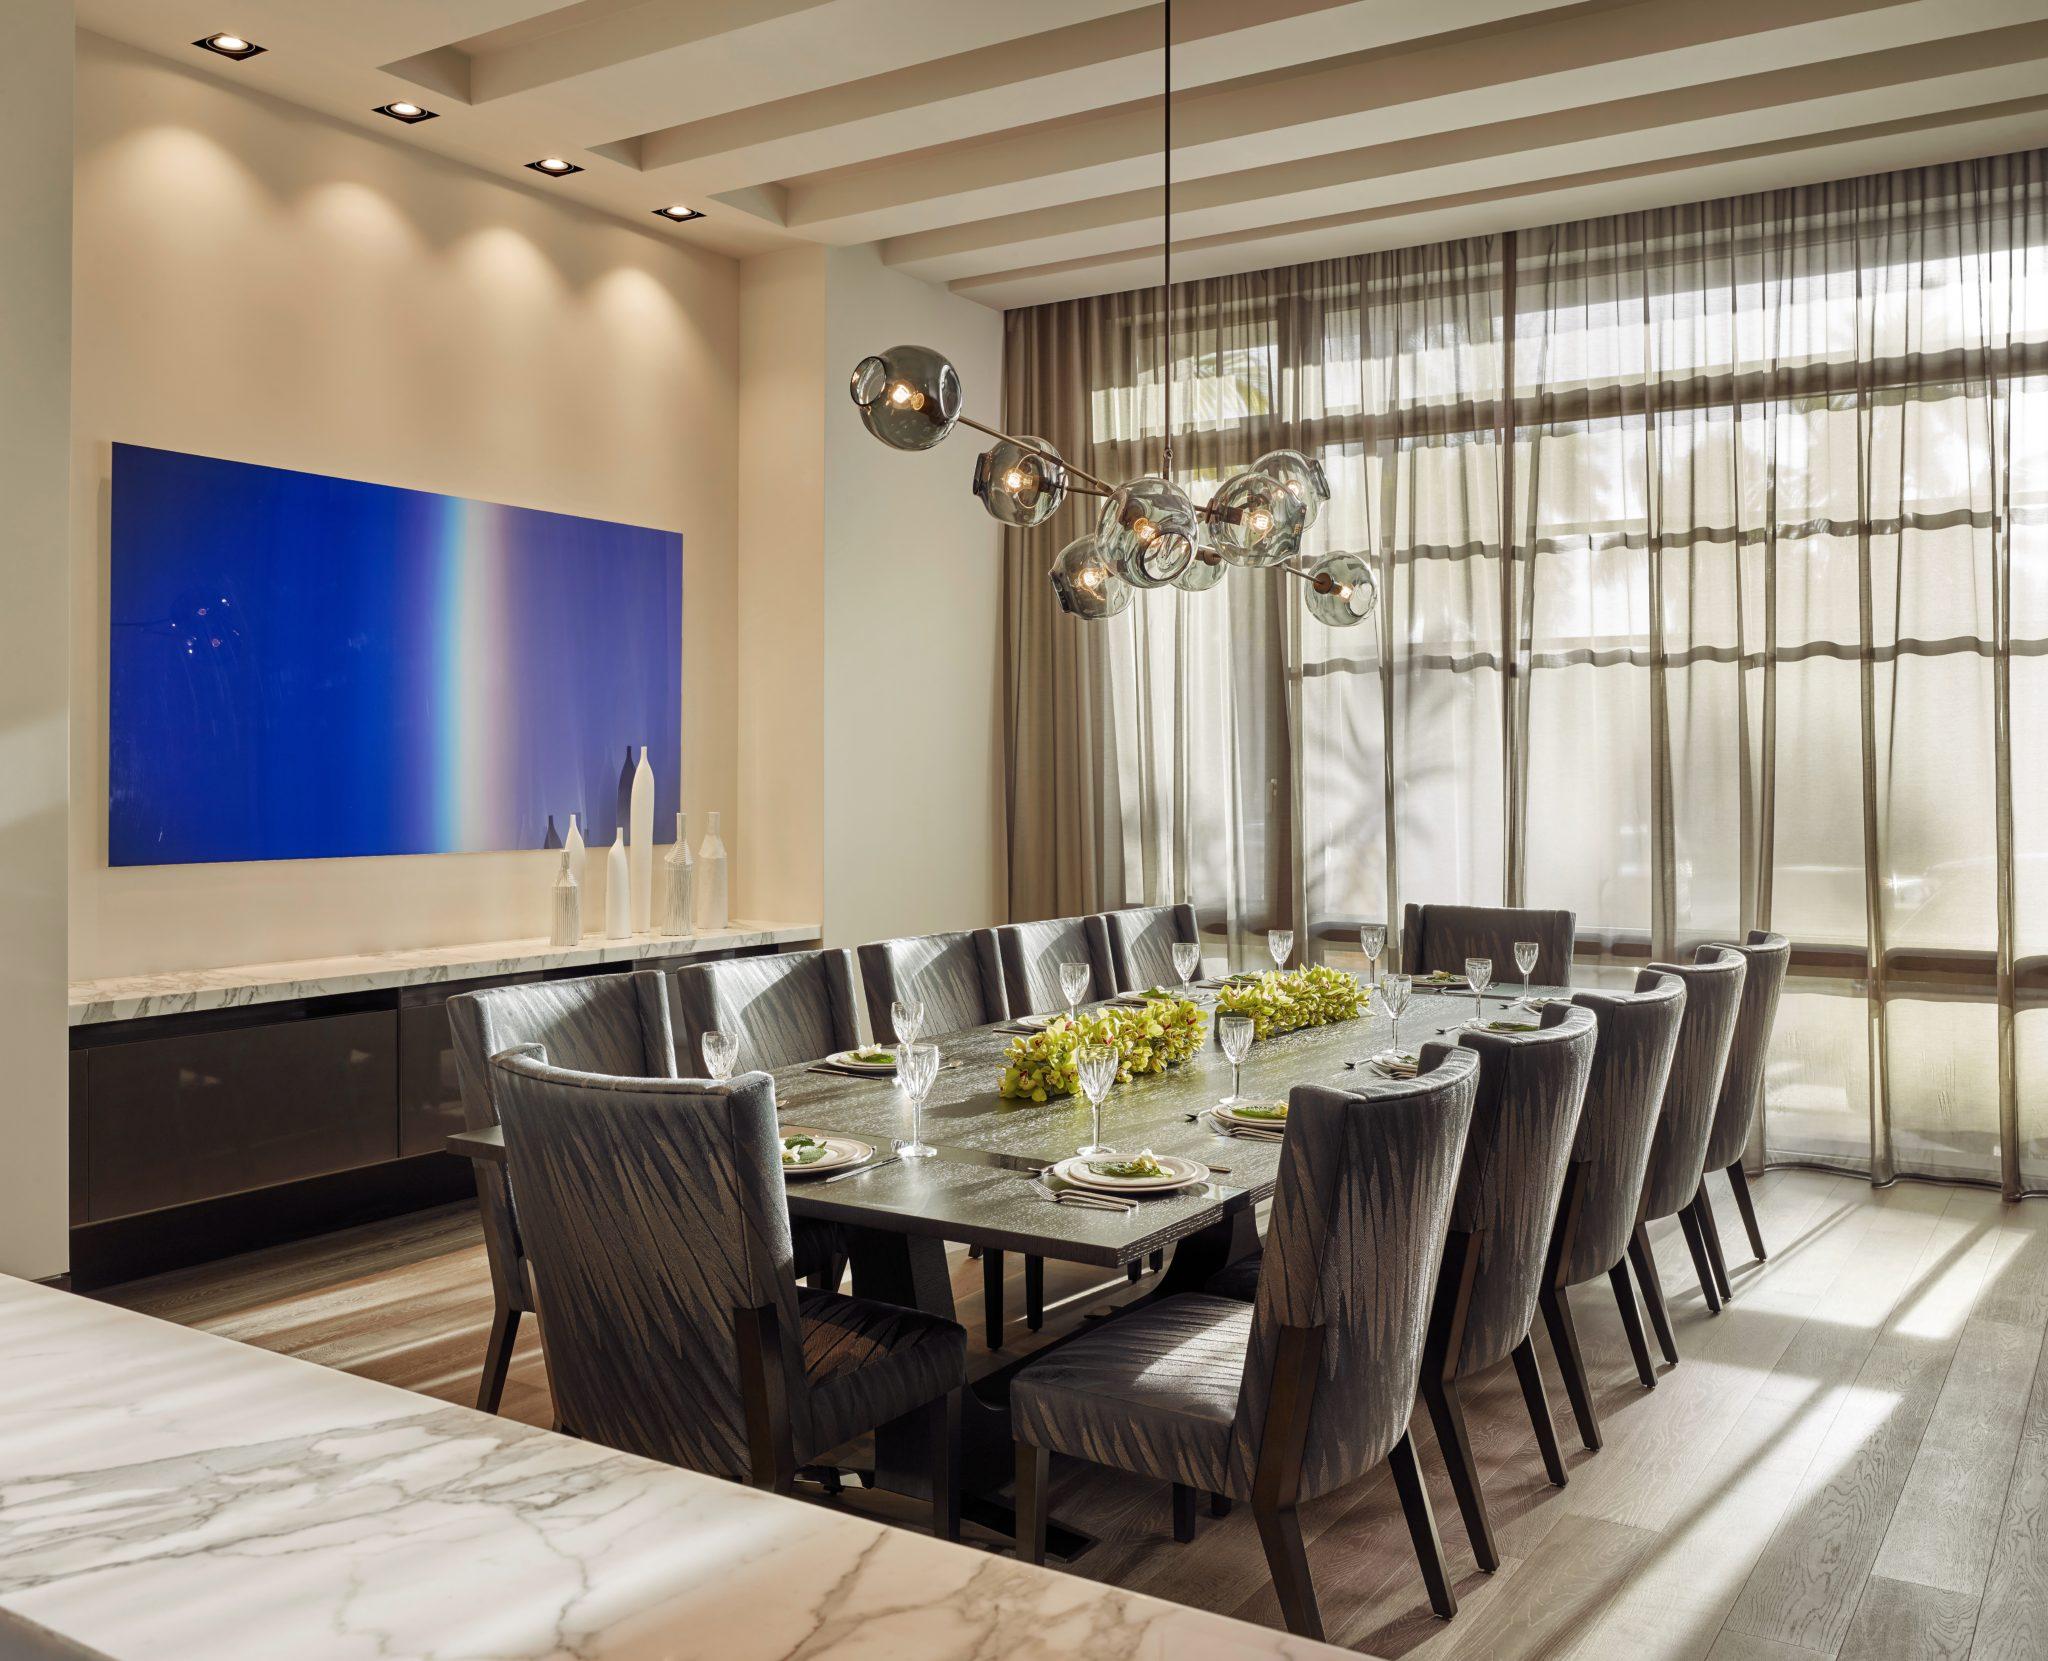 Intracoastal Dining Room by B+G Design